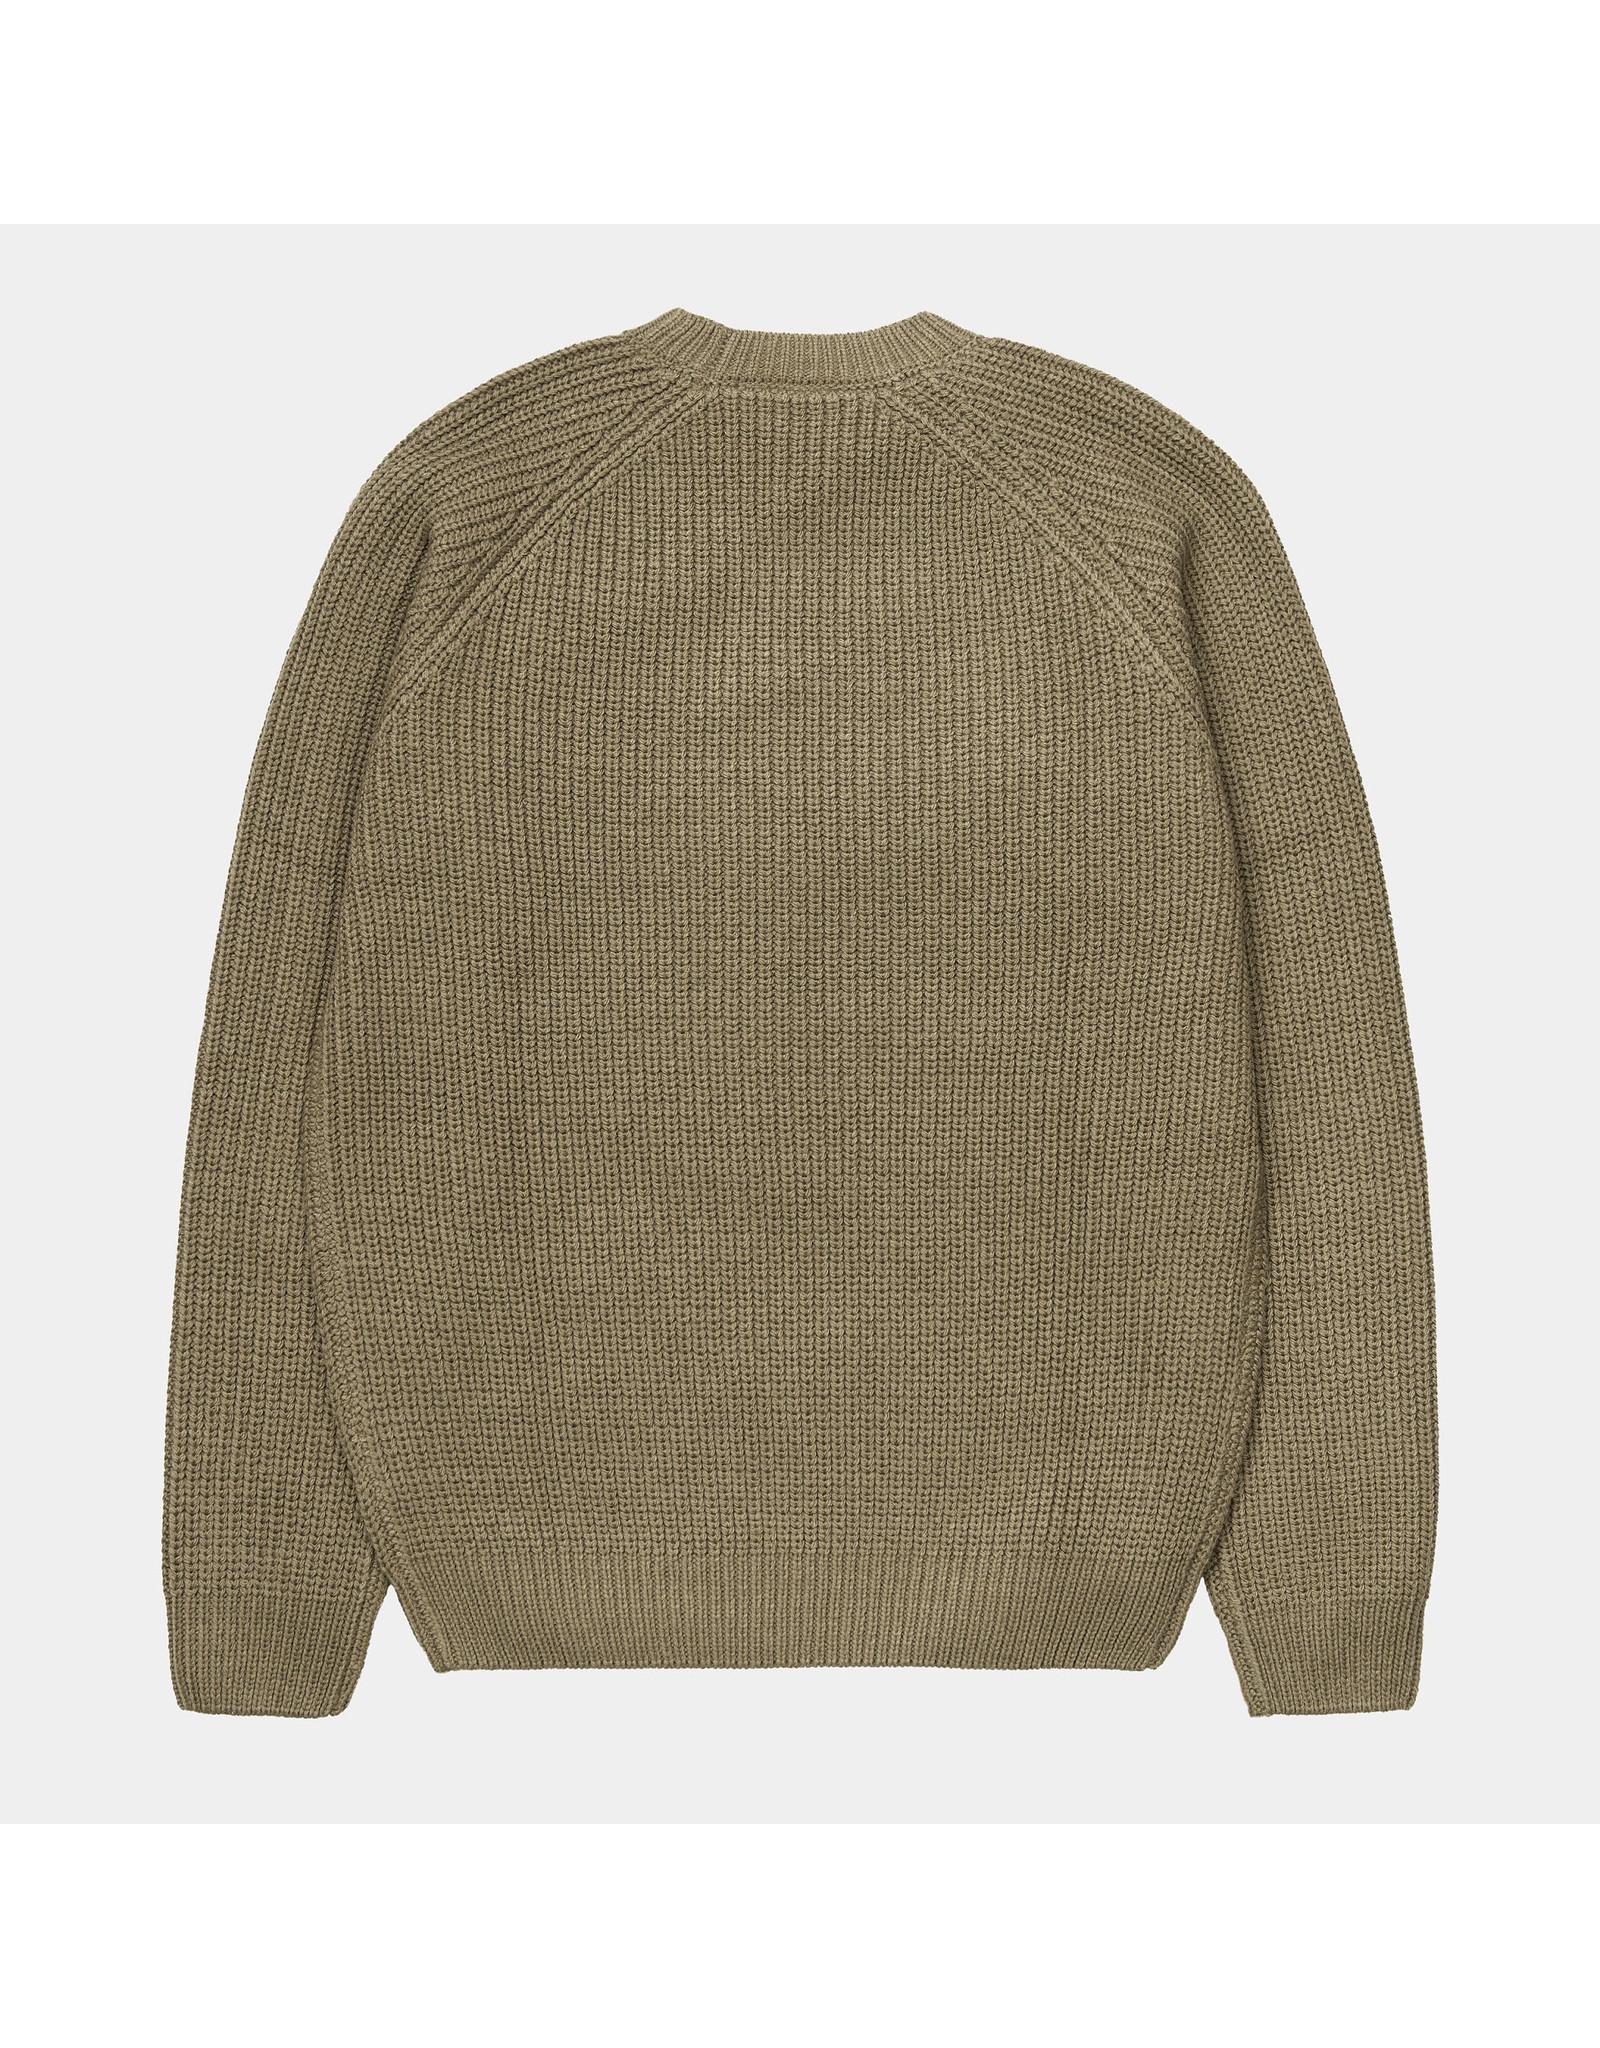 Carhartt Forth Sweater